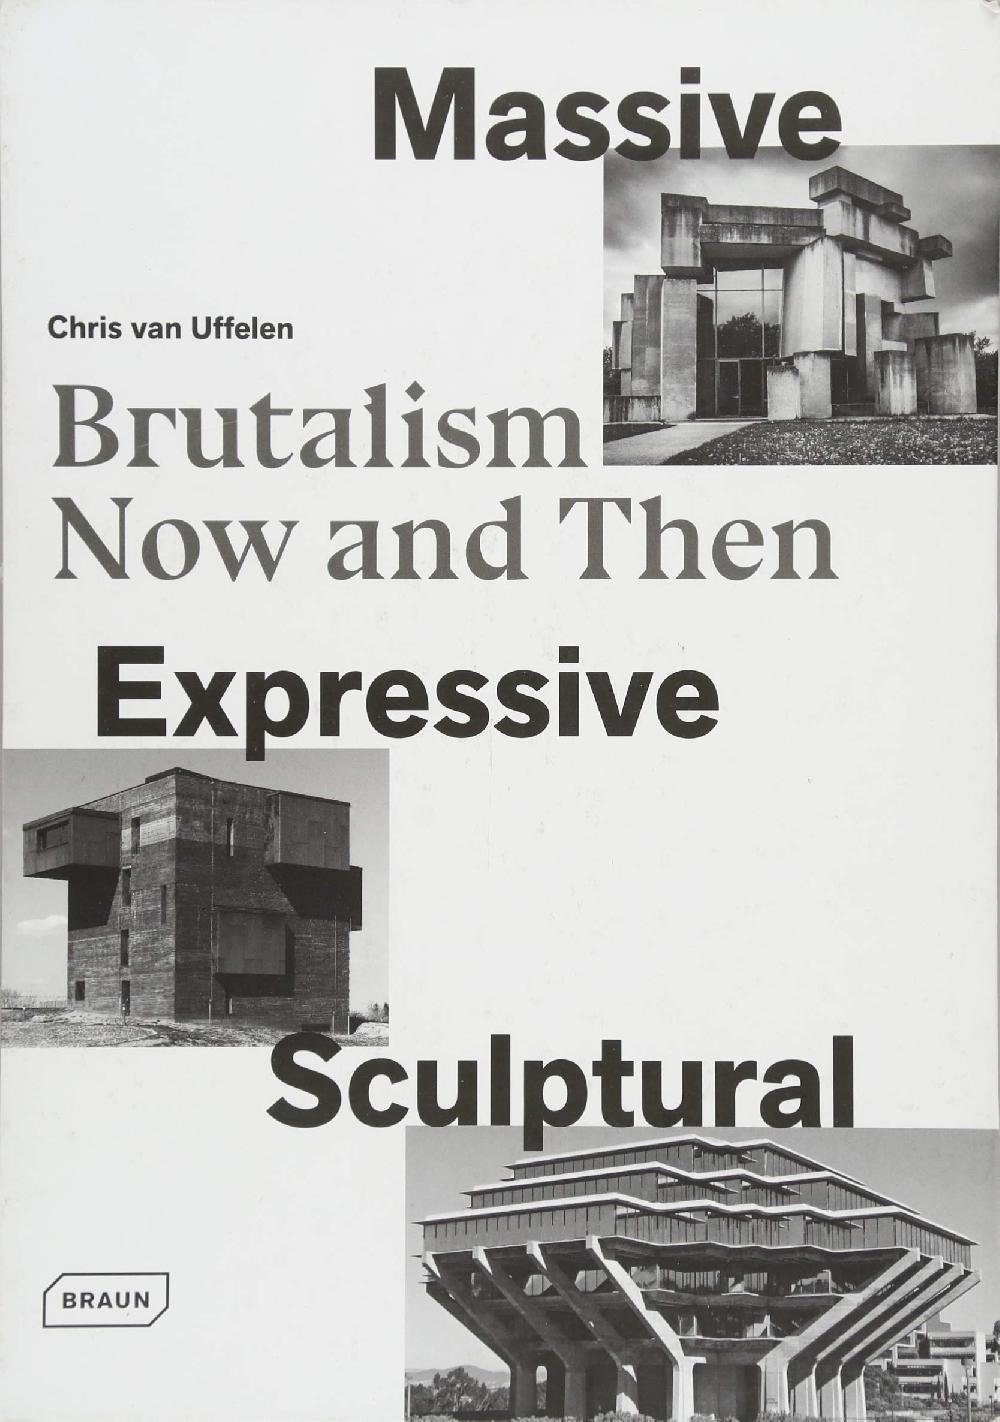 Massive, Expressive, Sculptural - Brutalism Now and Then